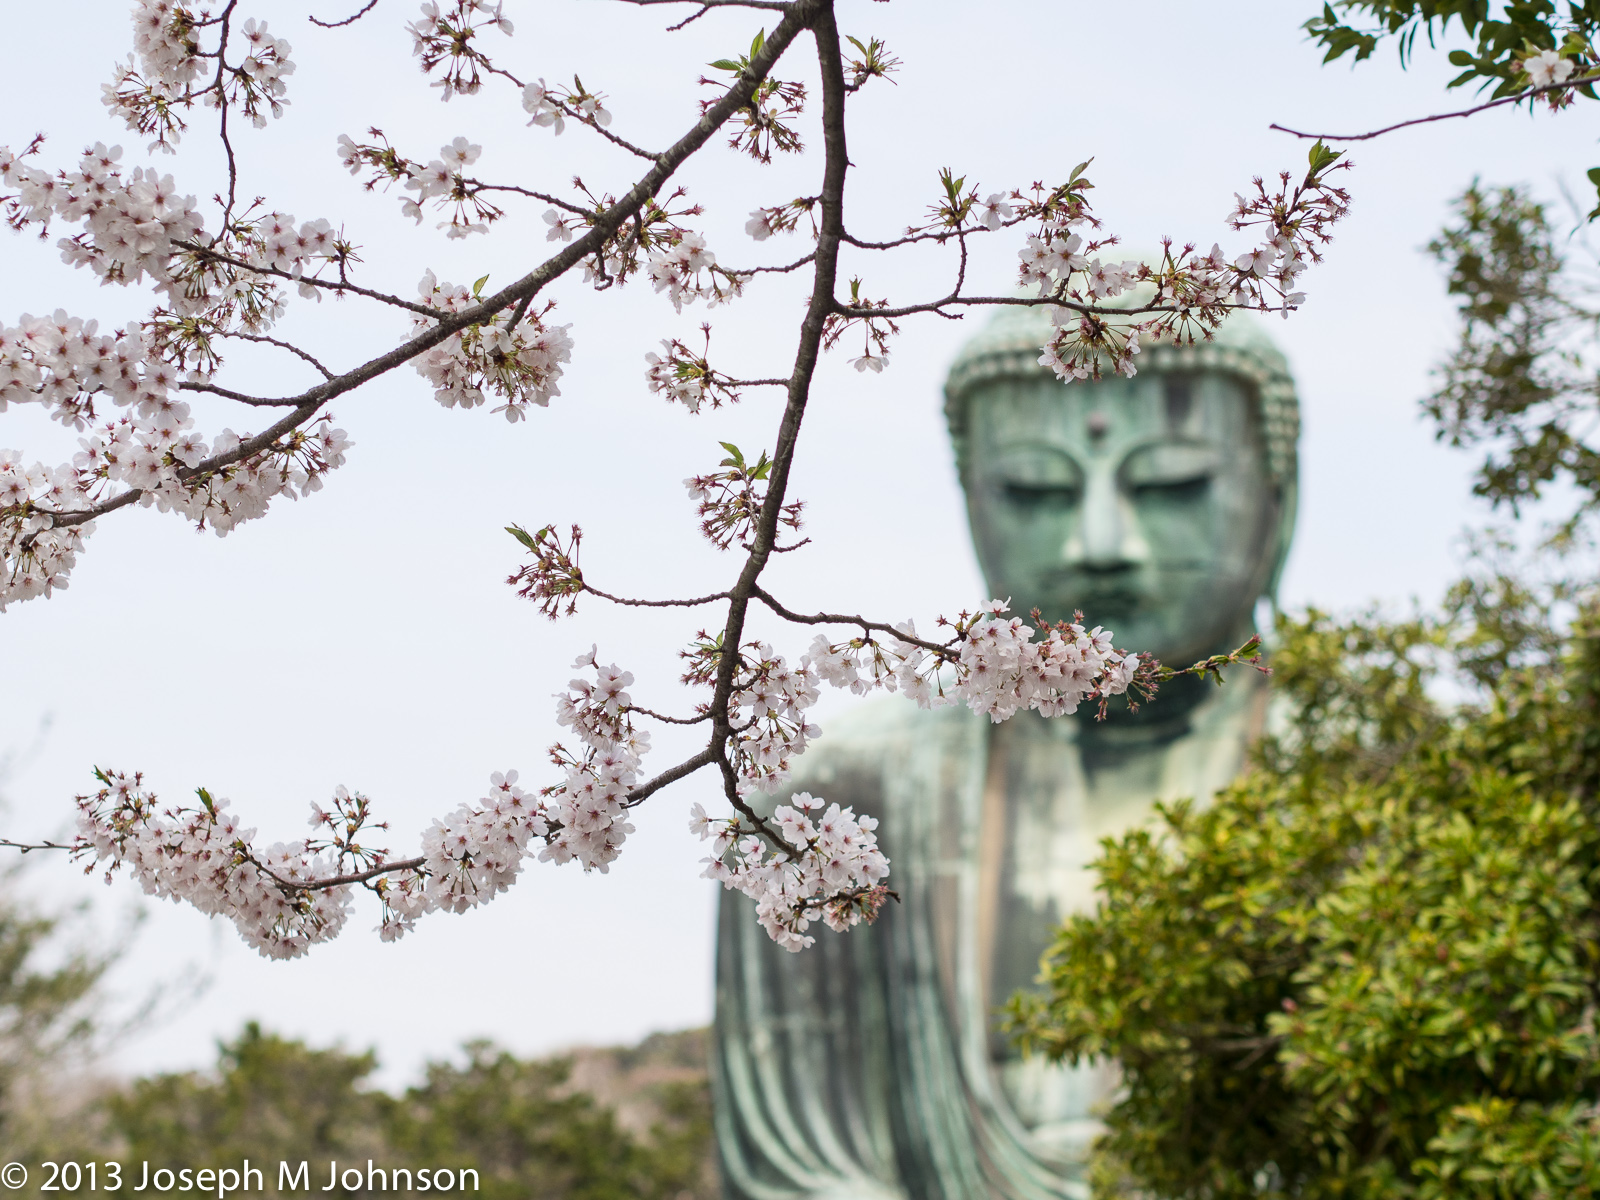 Sakura blooms against the Daibutsu